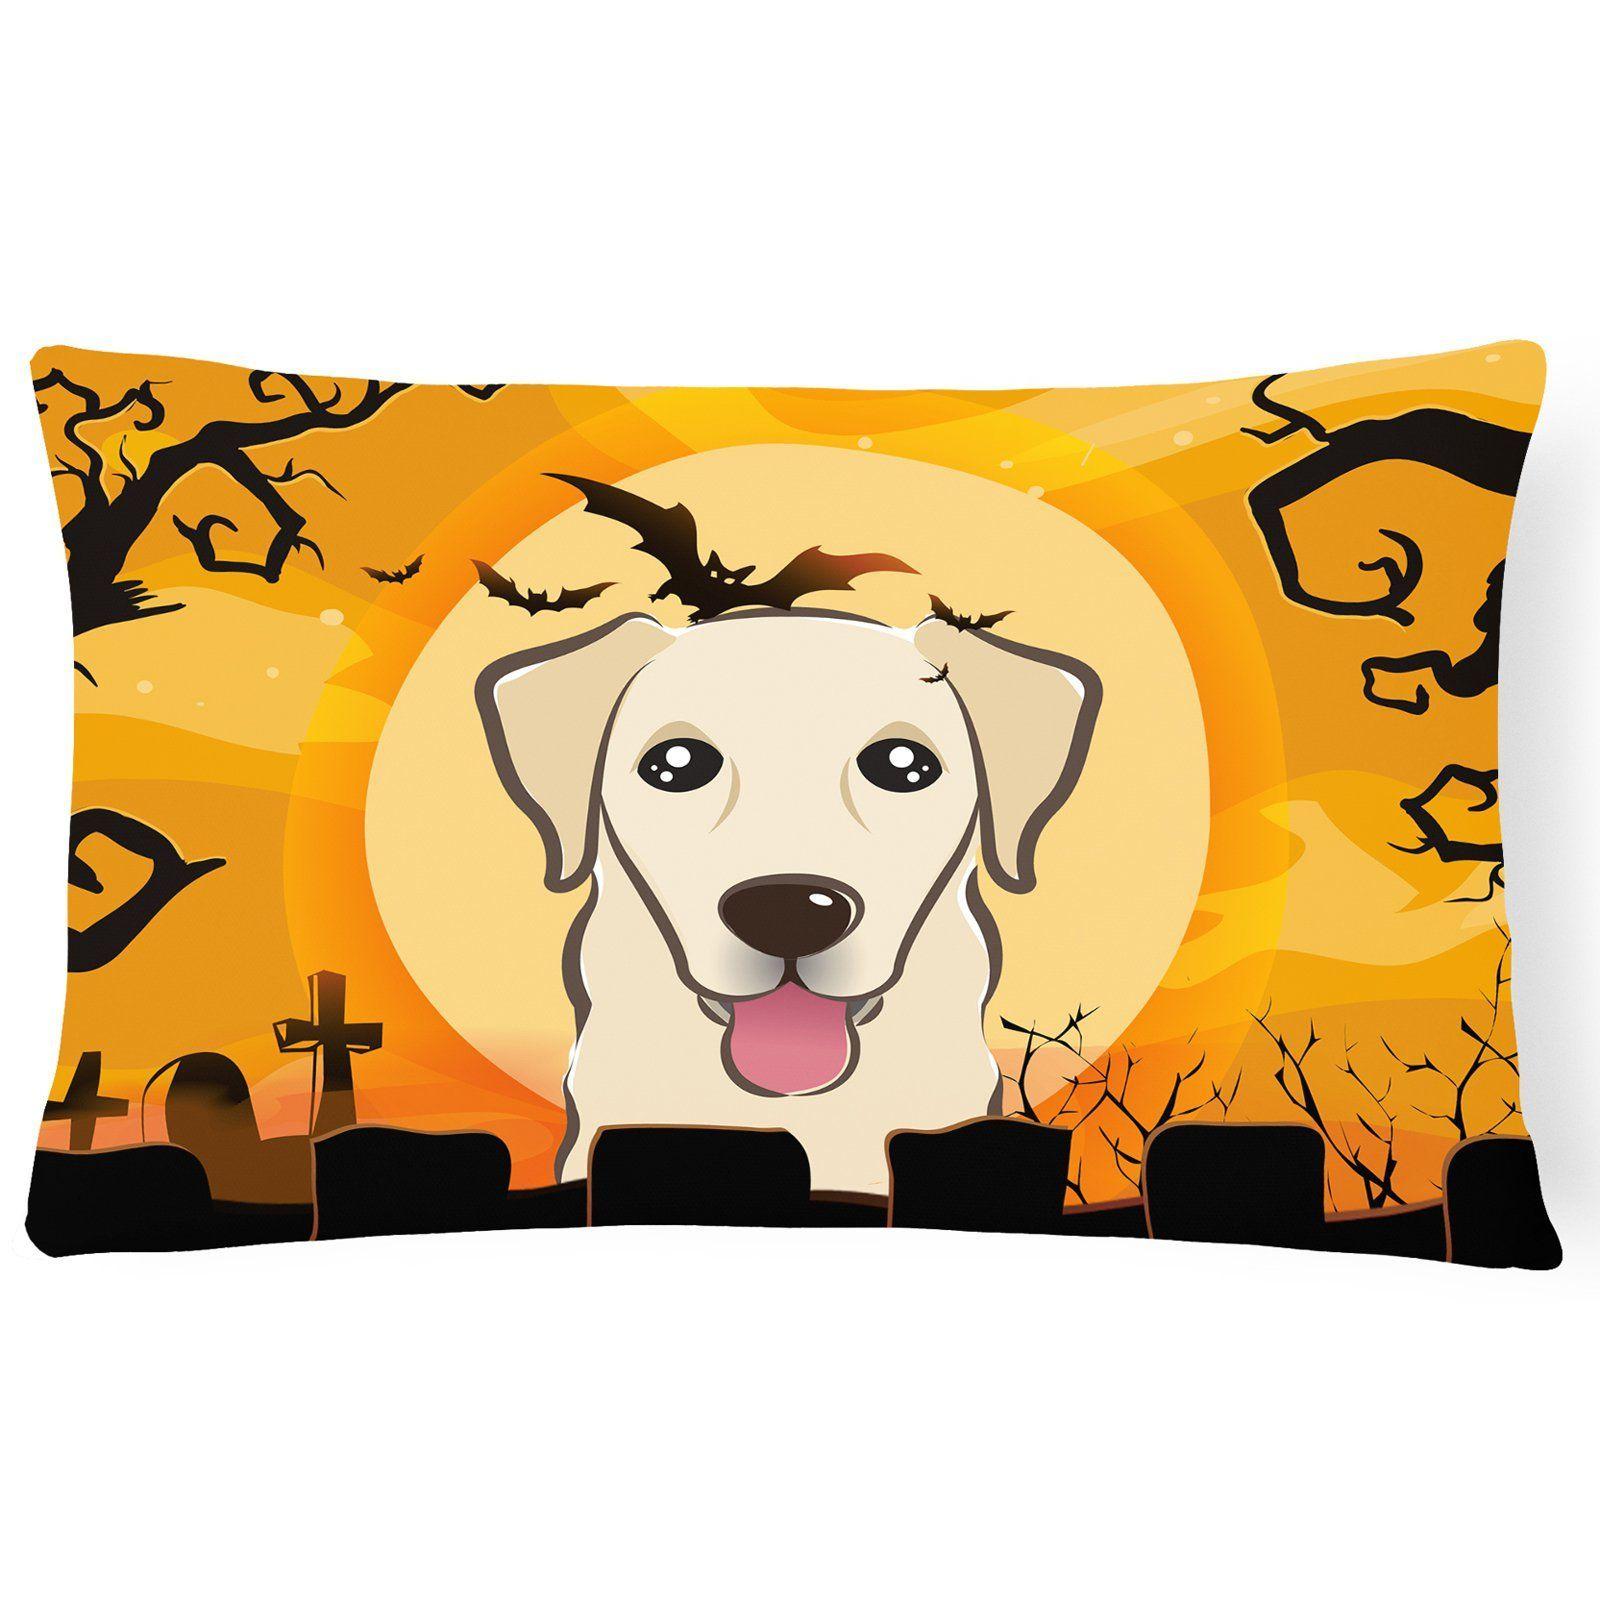 Carolines Treasures Halloween Golden Retriever Rectangle Decorative Outdoor Pillow - BB1810PW1216